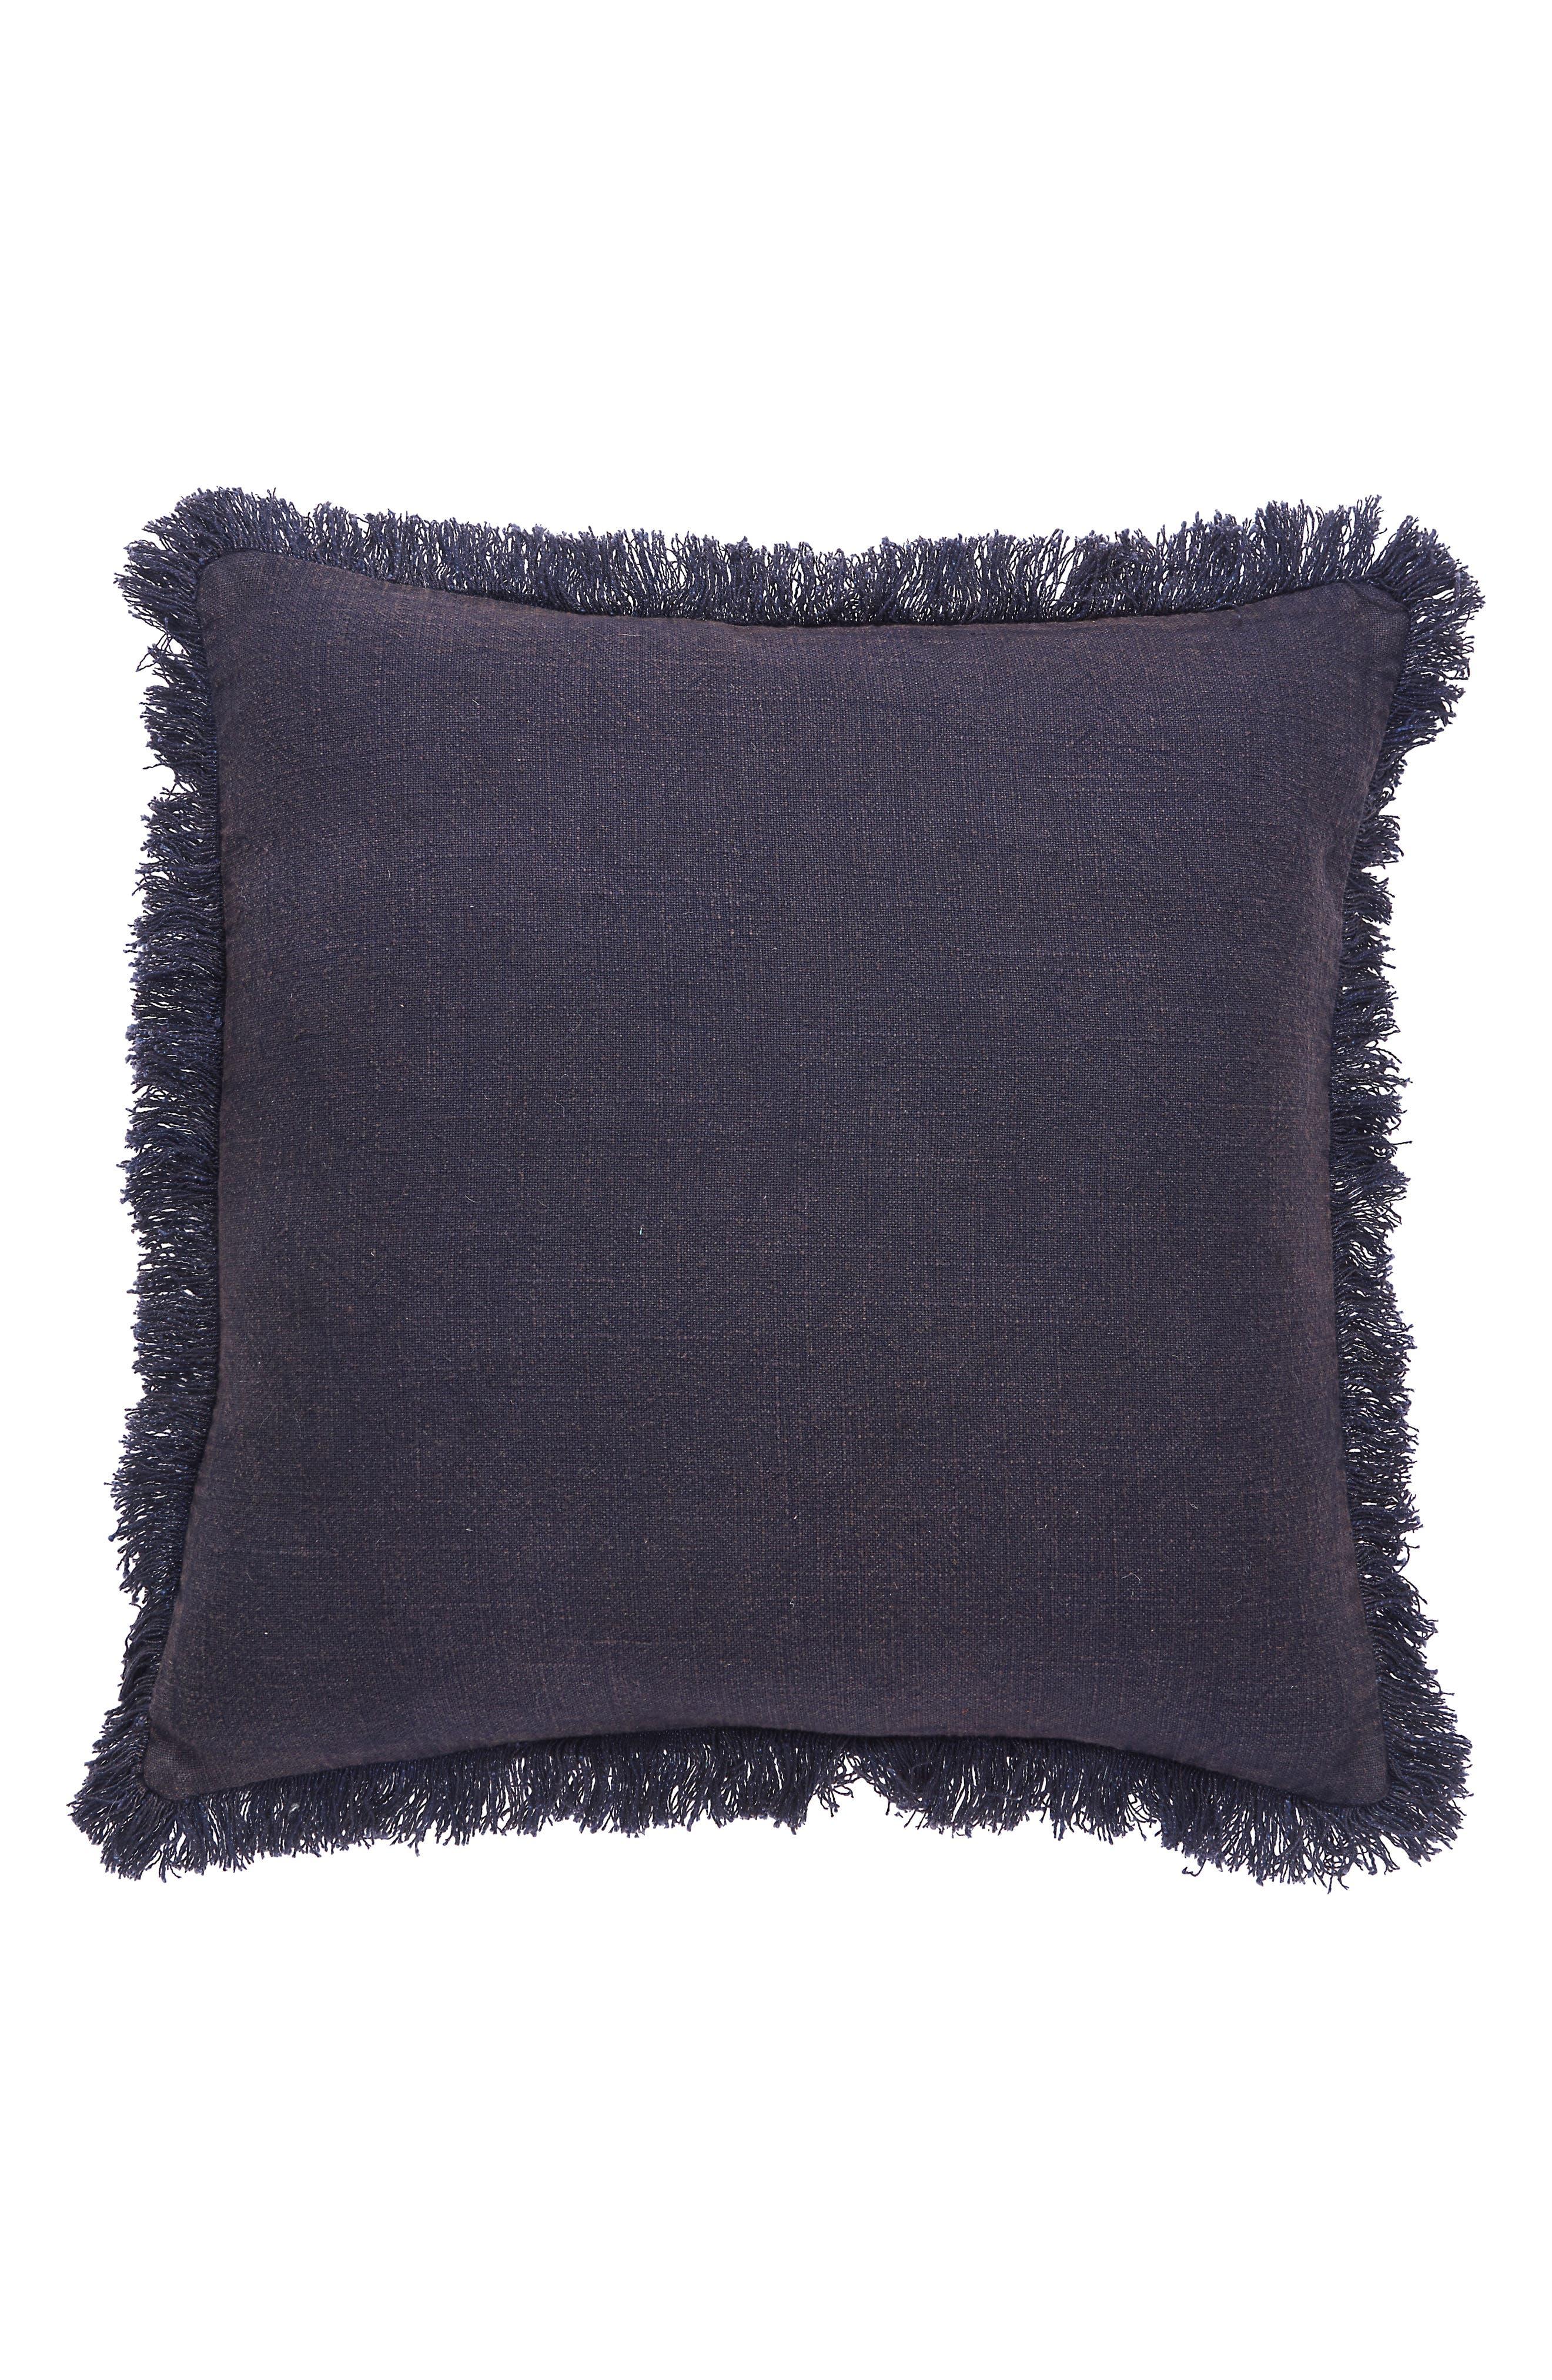 Greystone Accent Pillow,                             Main thumbnail 1, color,